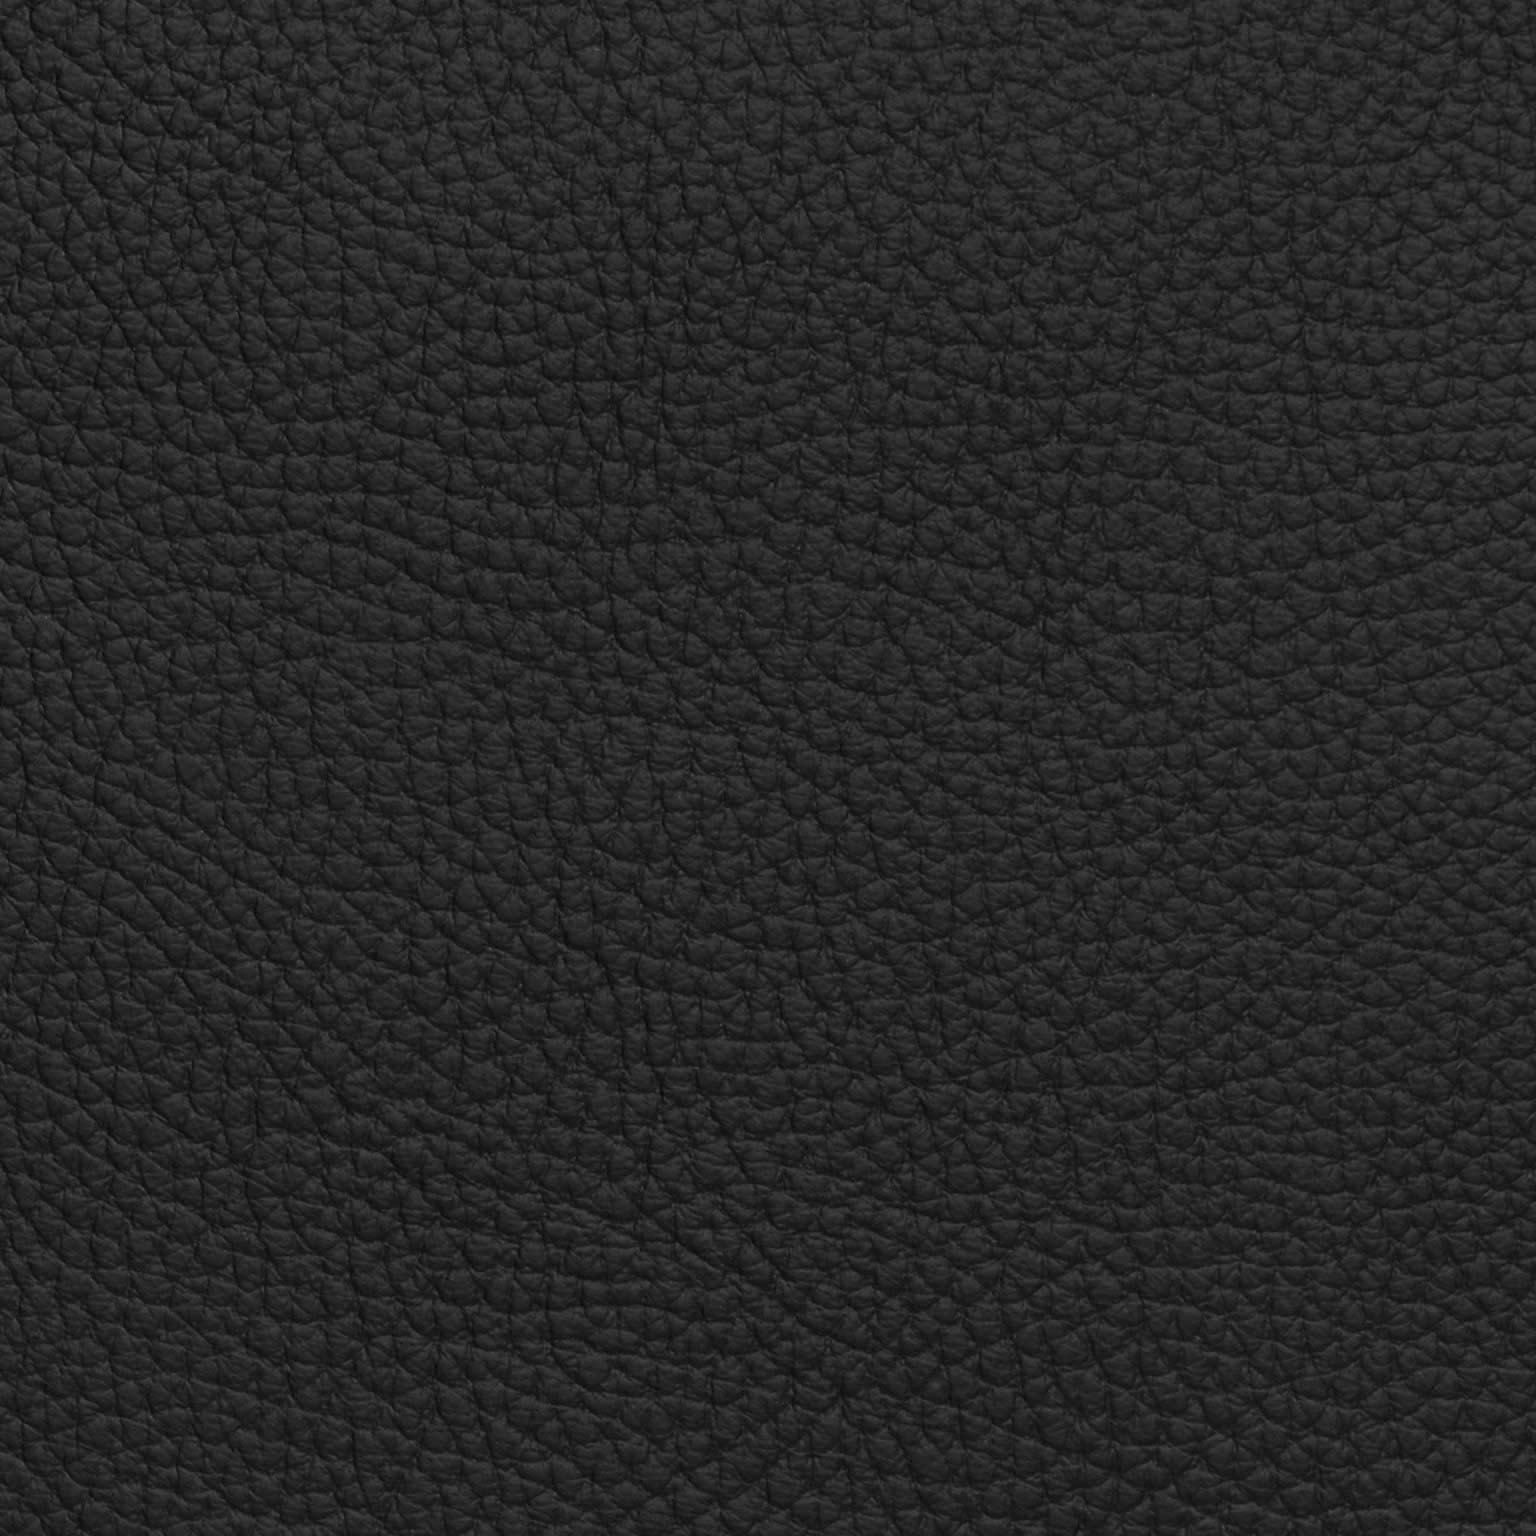 Ranchio leather_p11-055